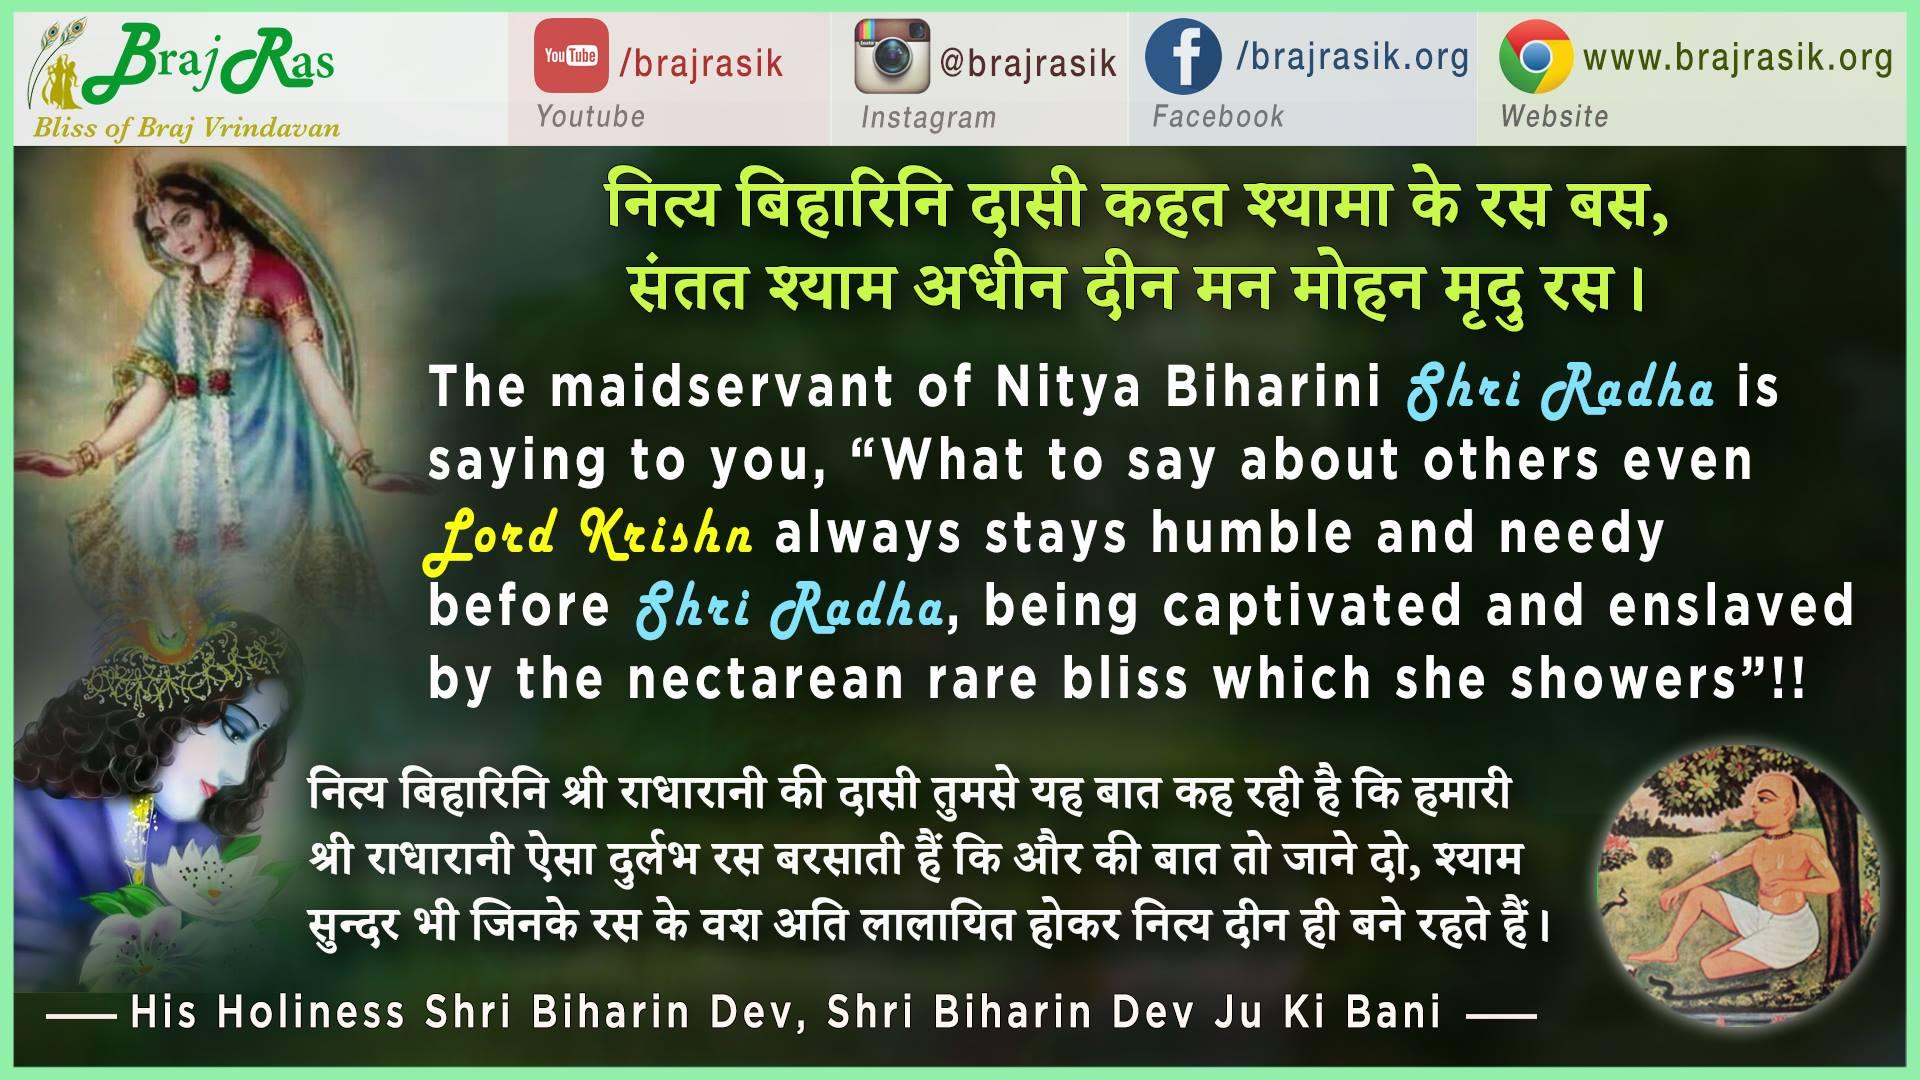 Nitya Biharini Dasi Kahat Shyama Ke Ras Bas - Shri Biharin Dev Ji, Shri Biharin Dev Ji Ki Vani